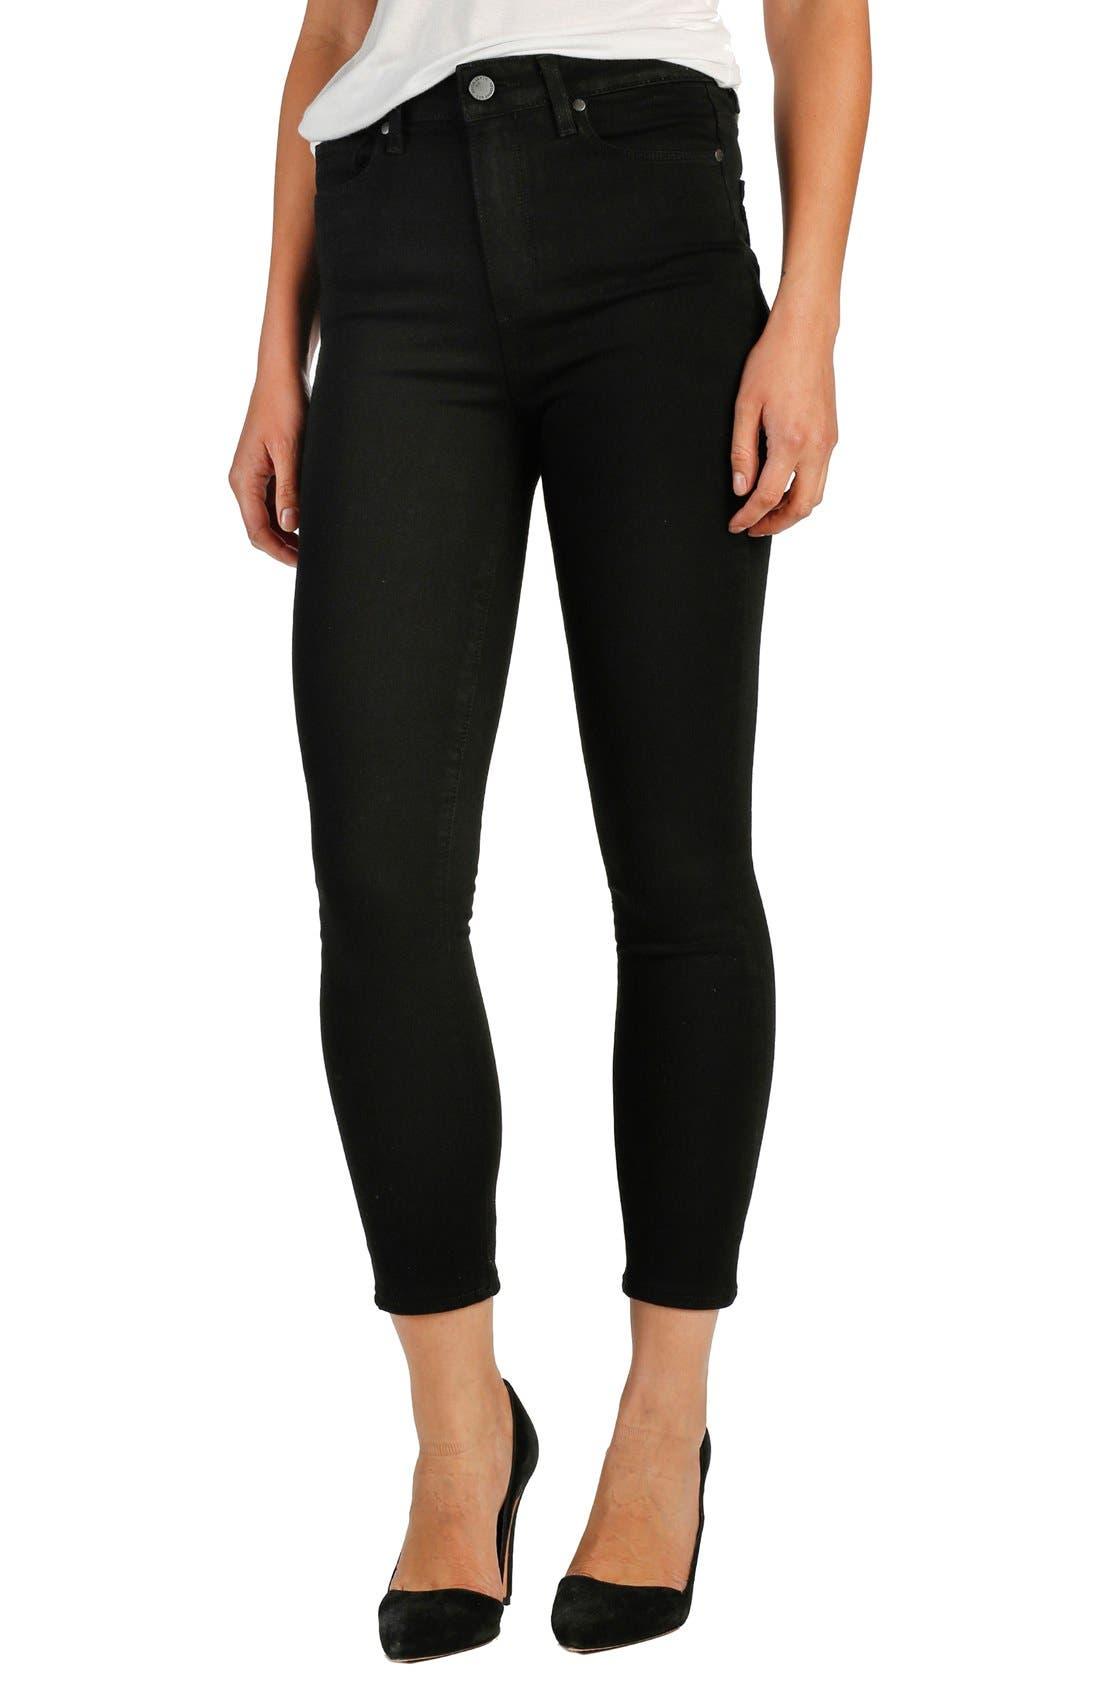 Transcend - Margot High Waist Crop Ultra Skinny Jeans,                         Main,                         color, 001